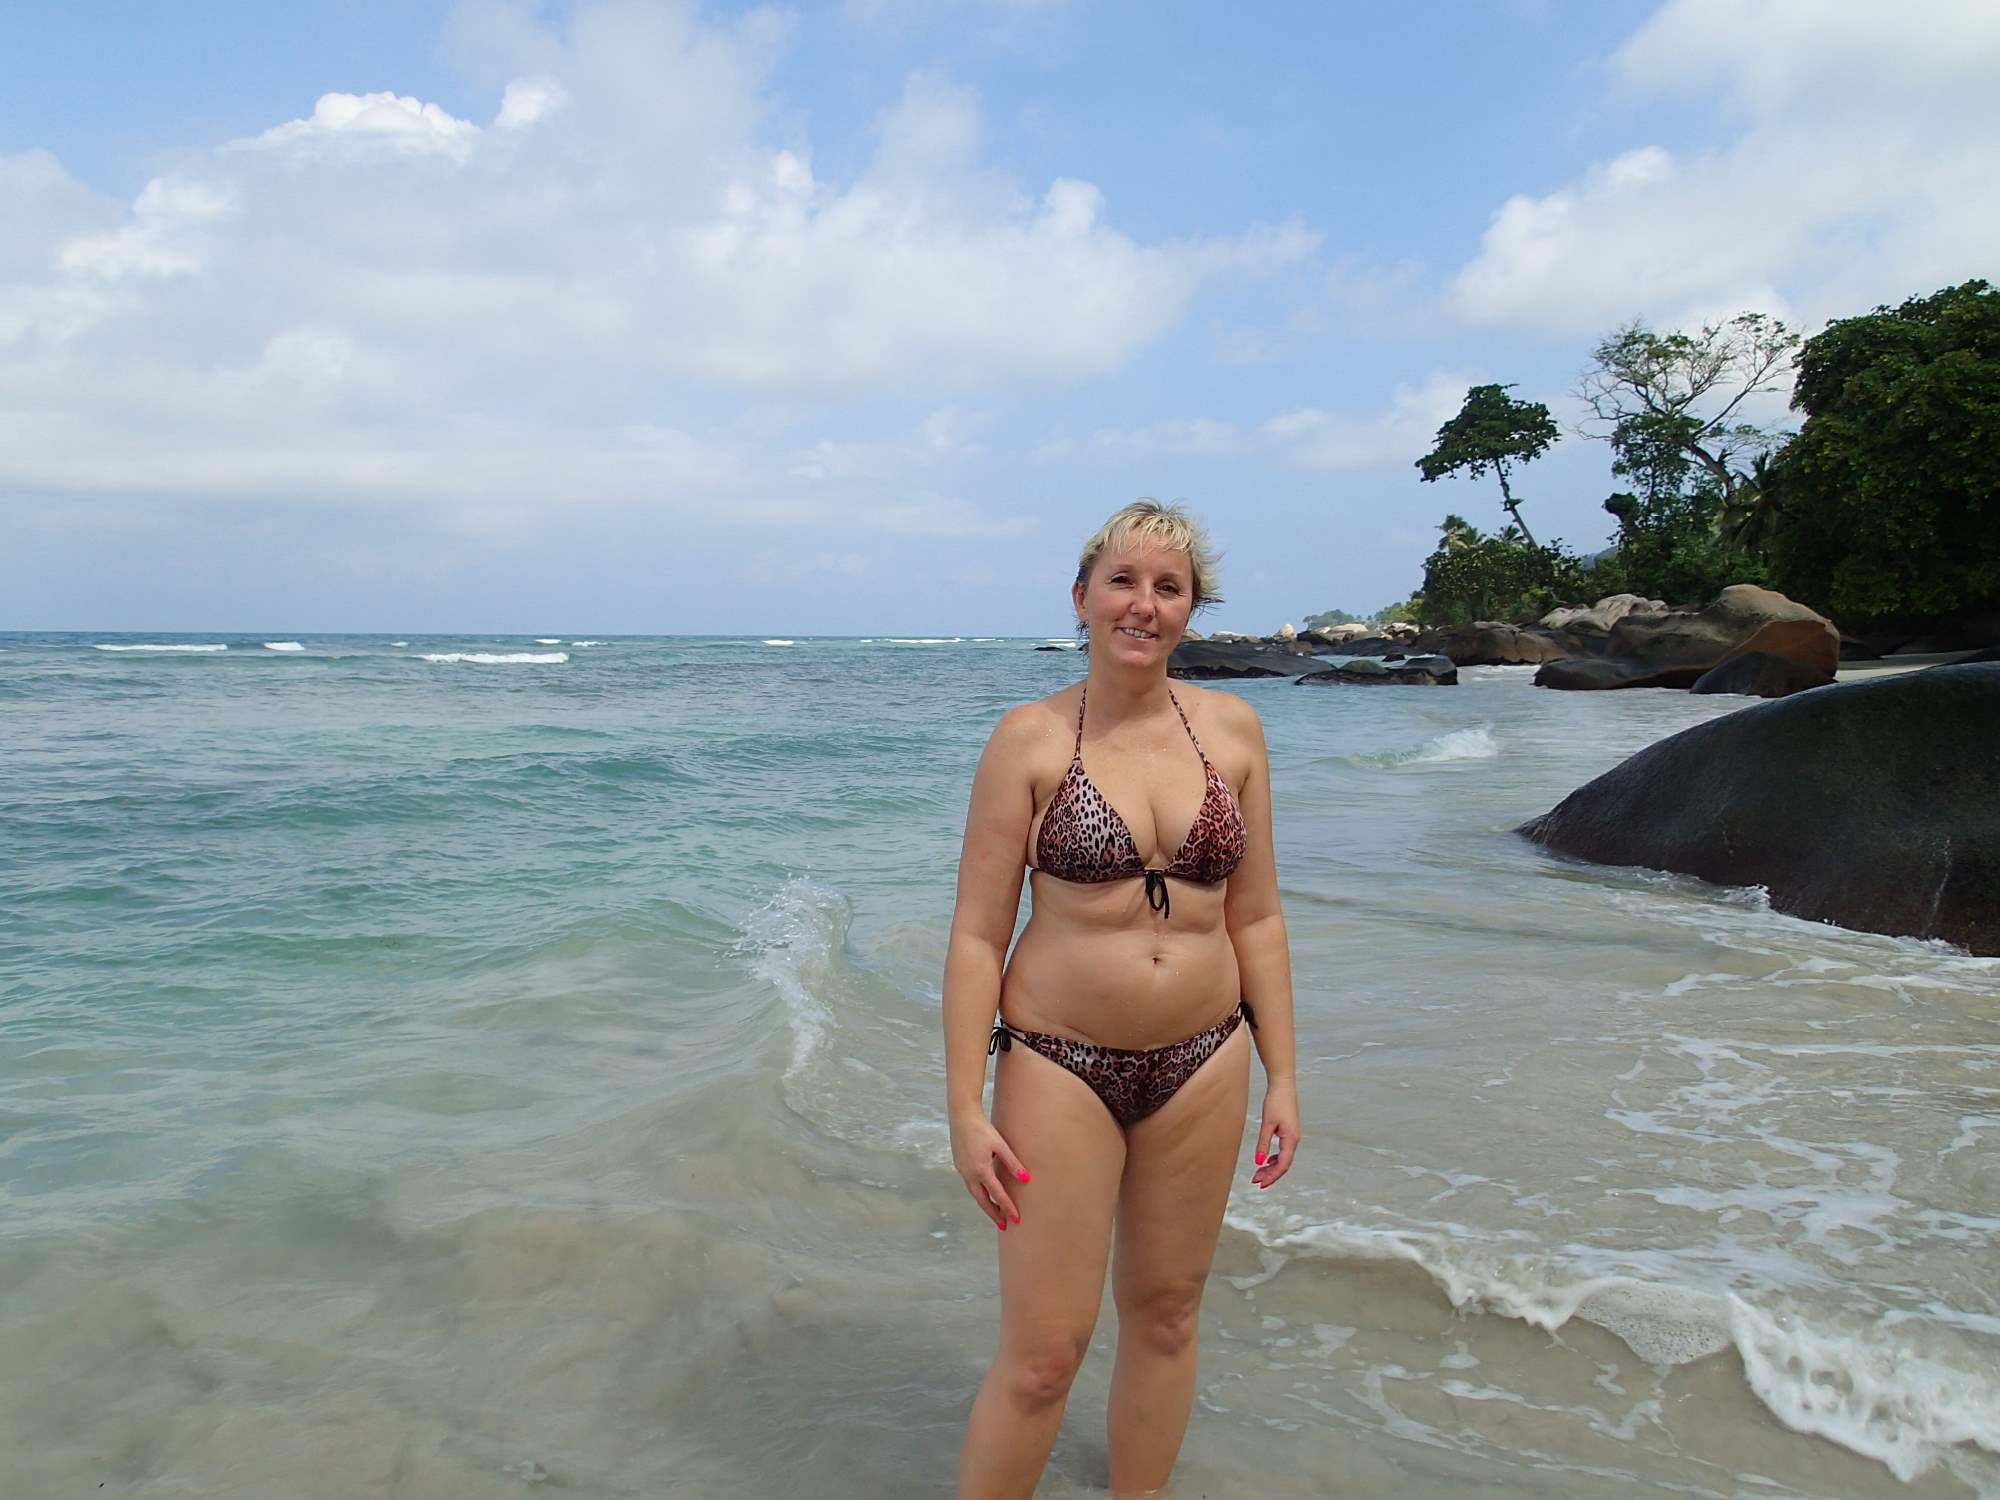 Fucking sexy. rajce most of nudist how like